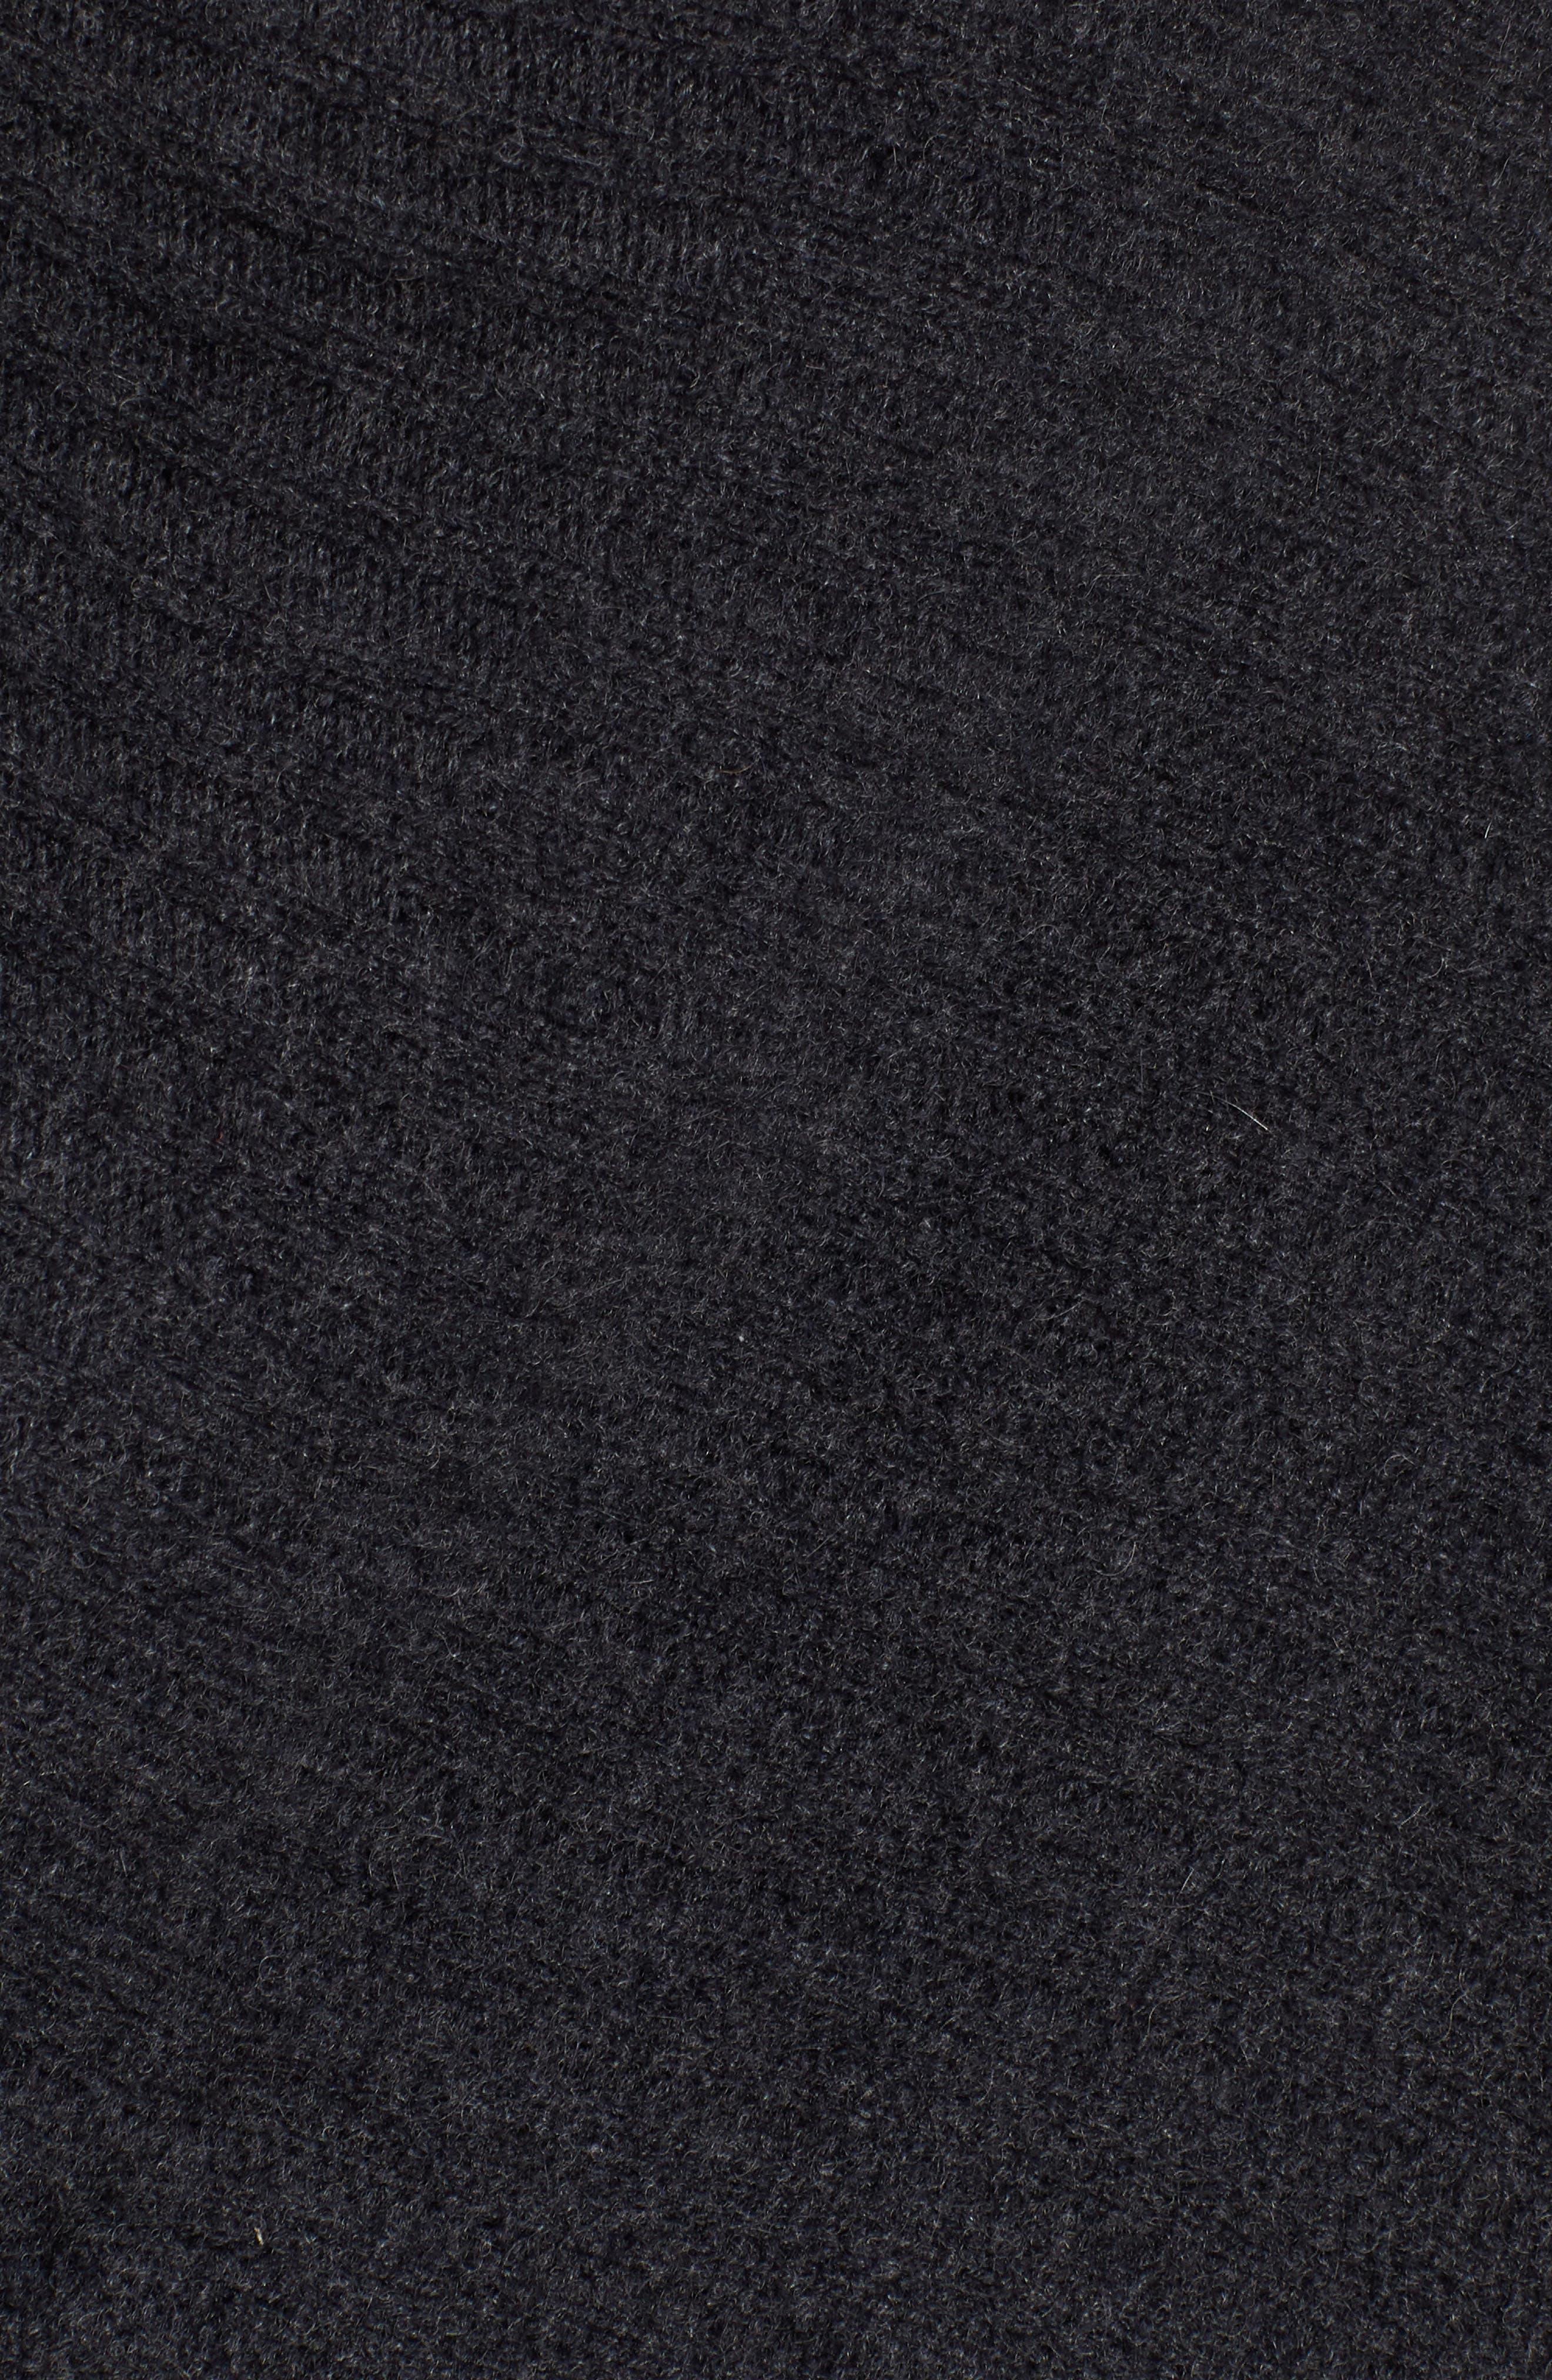 Ribbed Cashmere Wrap,                             Alternate thumbnail 5, color,                             001